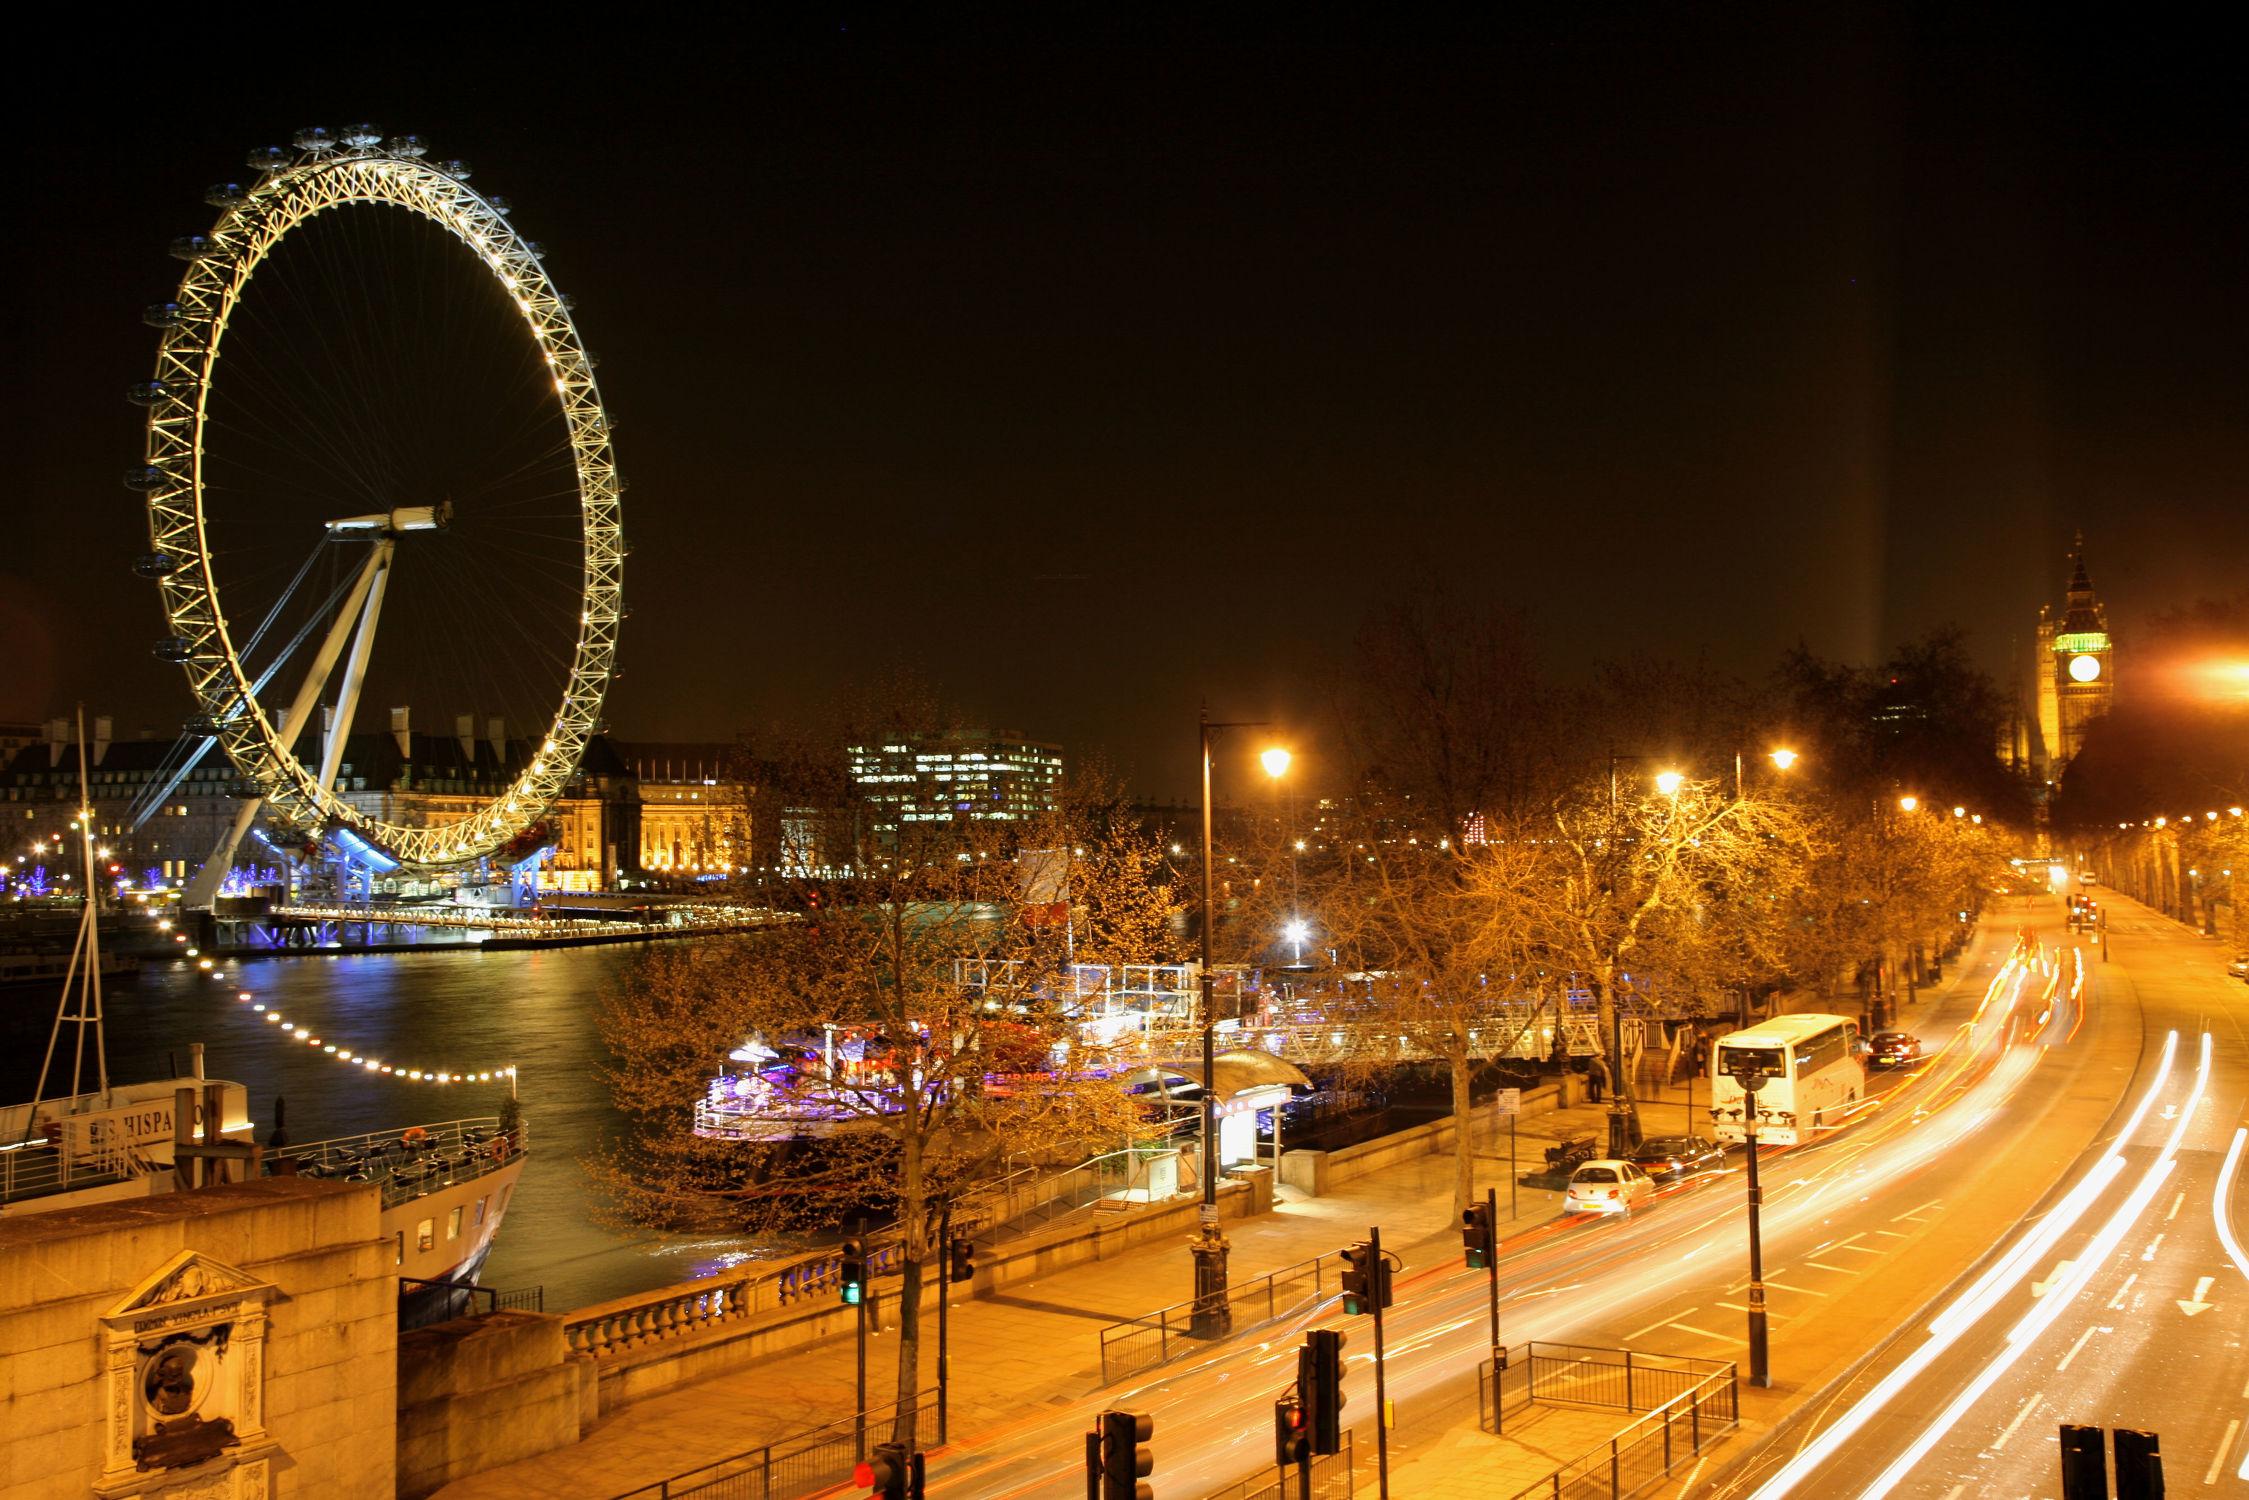 Bild mit Städte, England, London, Stadt, City of London, City, Nacht, Stadtleben, Riesenrad, London Eye